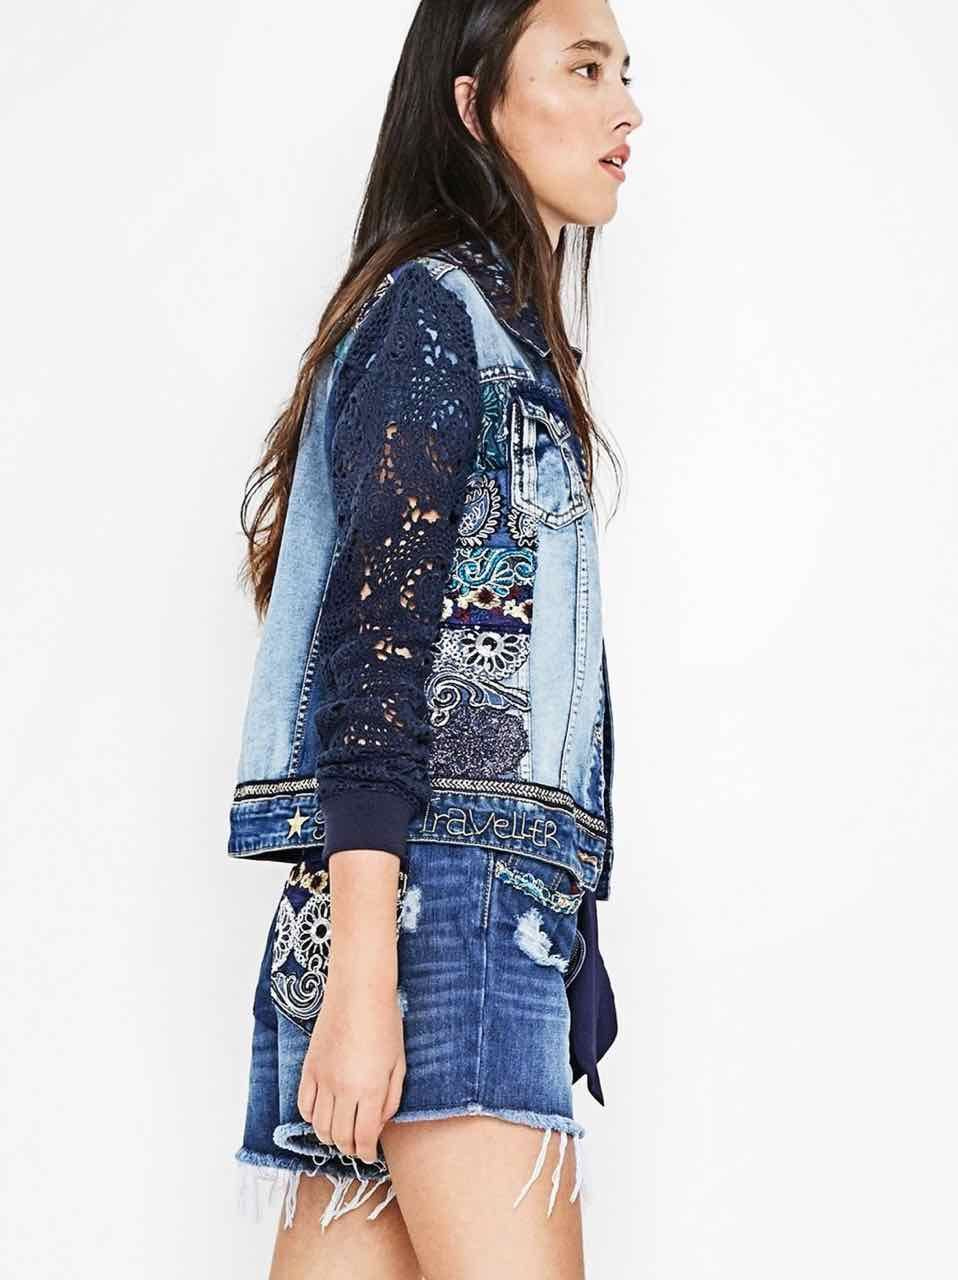 72E2JC7_5053 Desigual Denim Jacket Exotic Blue Buy Online